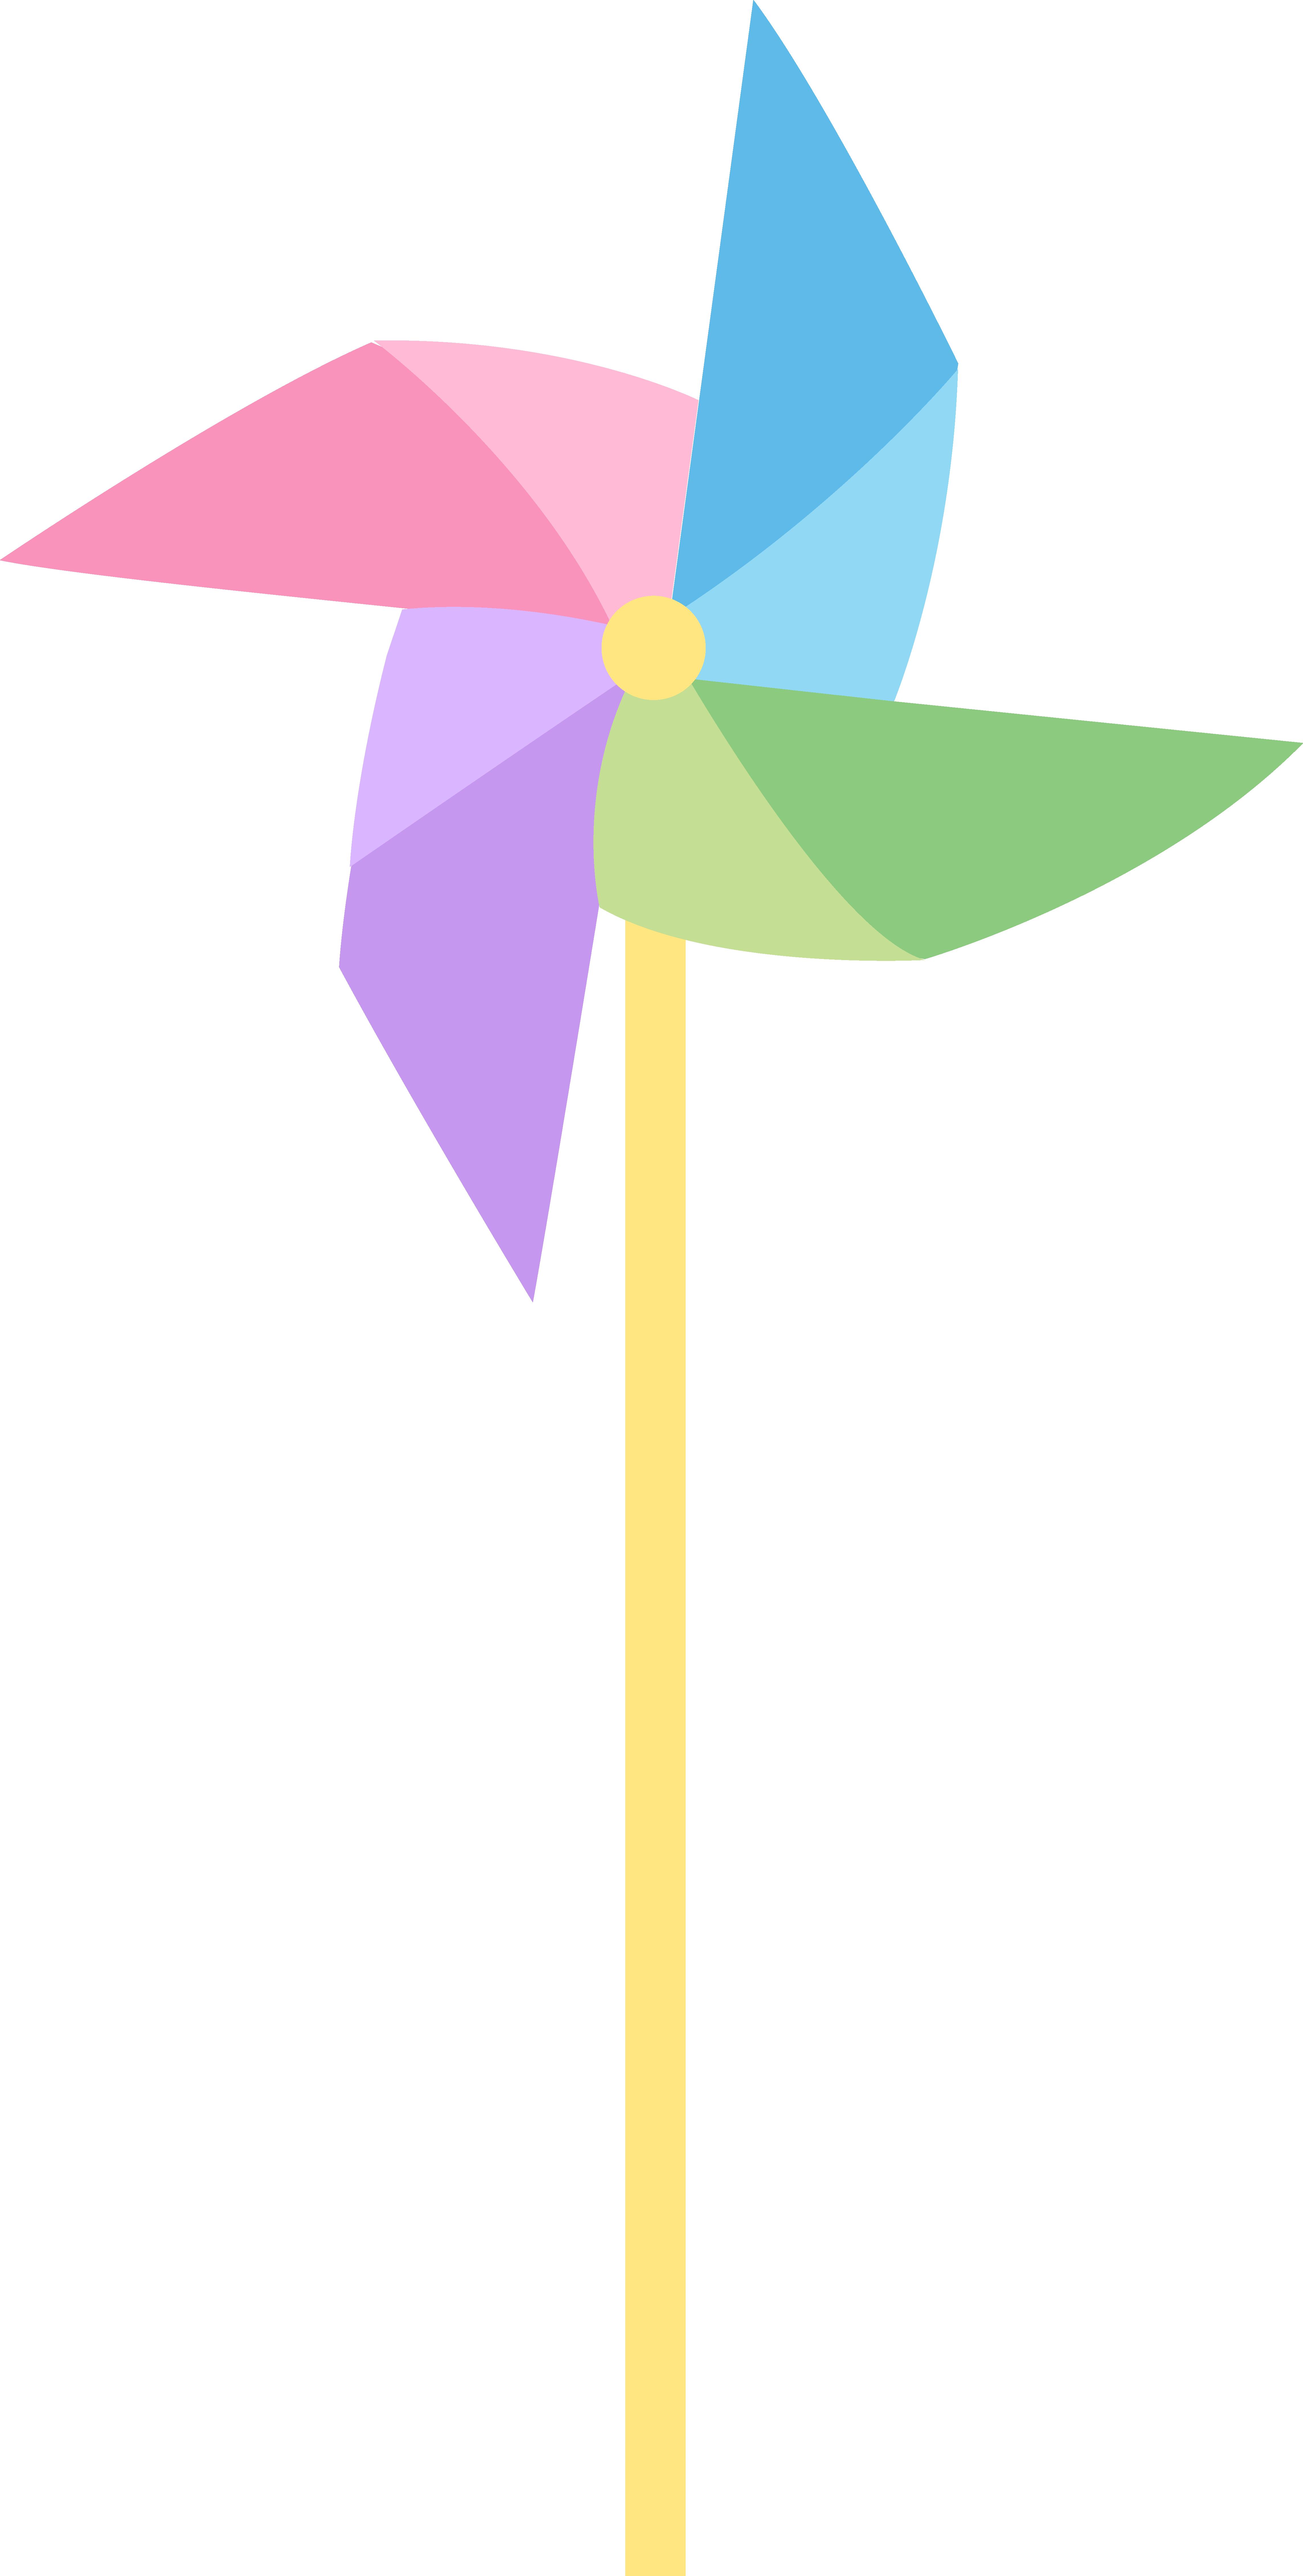 Pastel clipart clip art transparent download Pastel Colored Pinwheel - Free Clip Art clip art transparent download